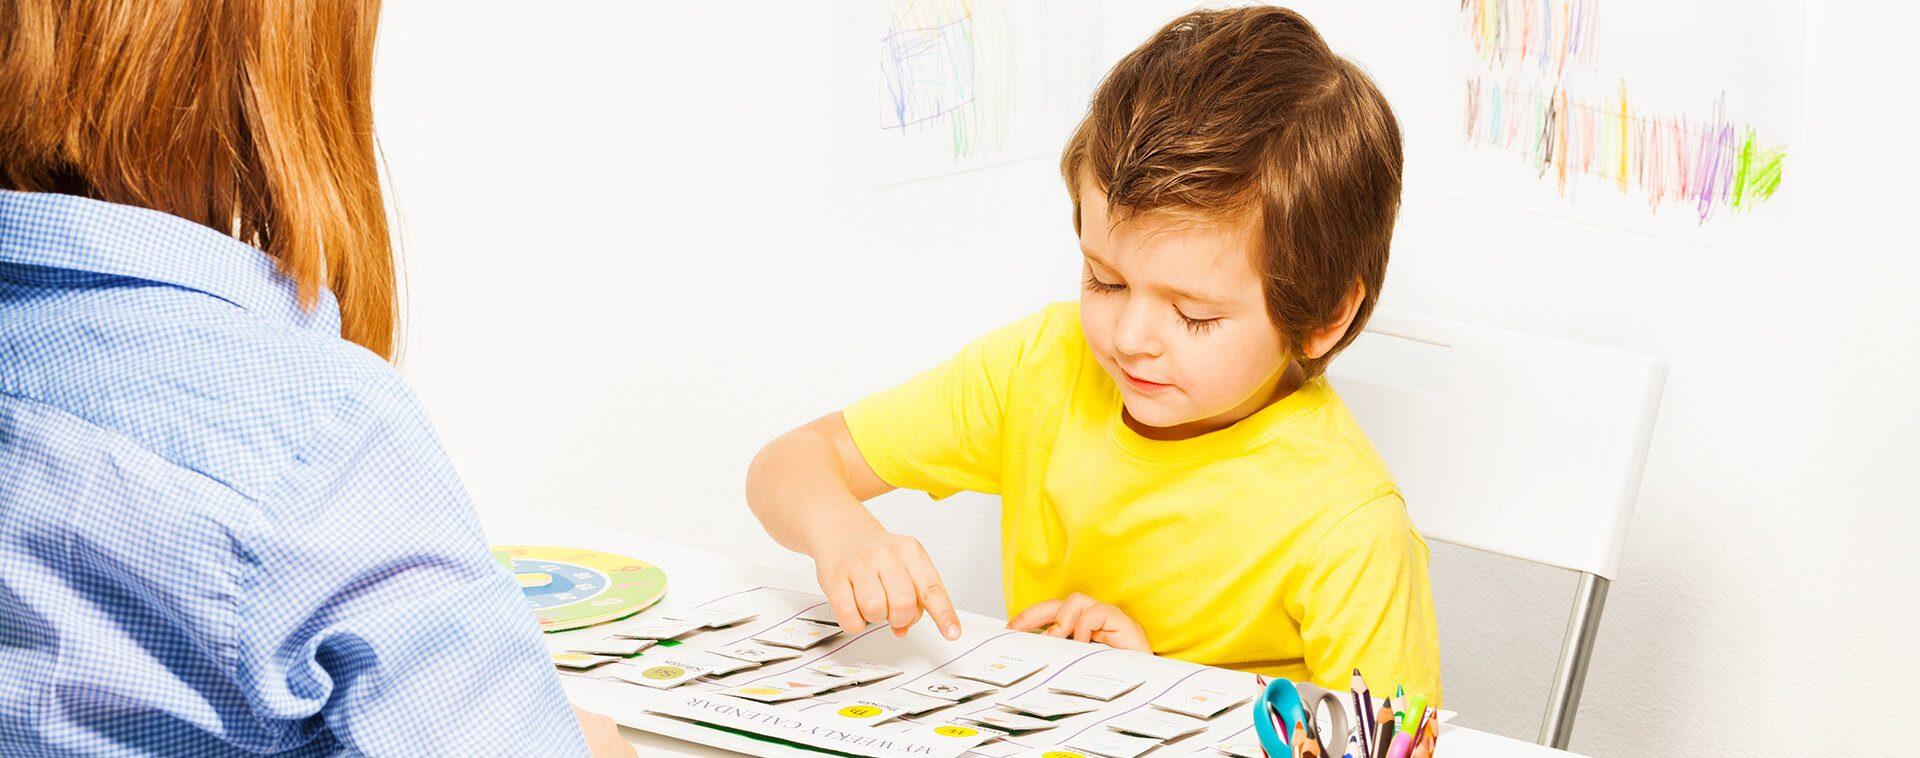 Contact Schedules for Children - Amani Mediation - Johannesburg